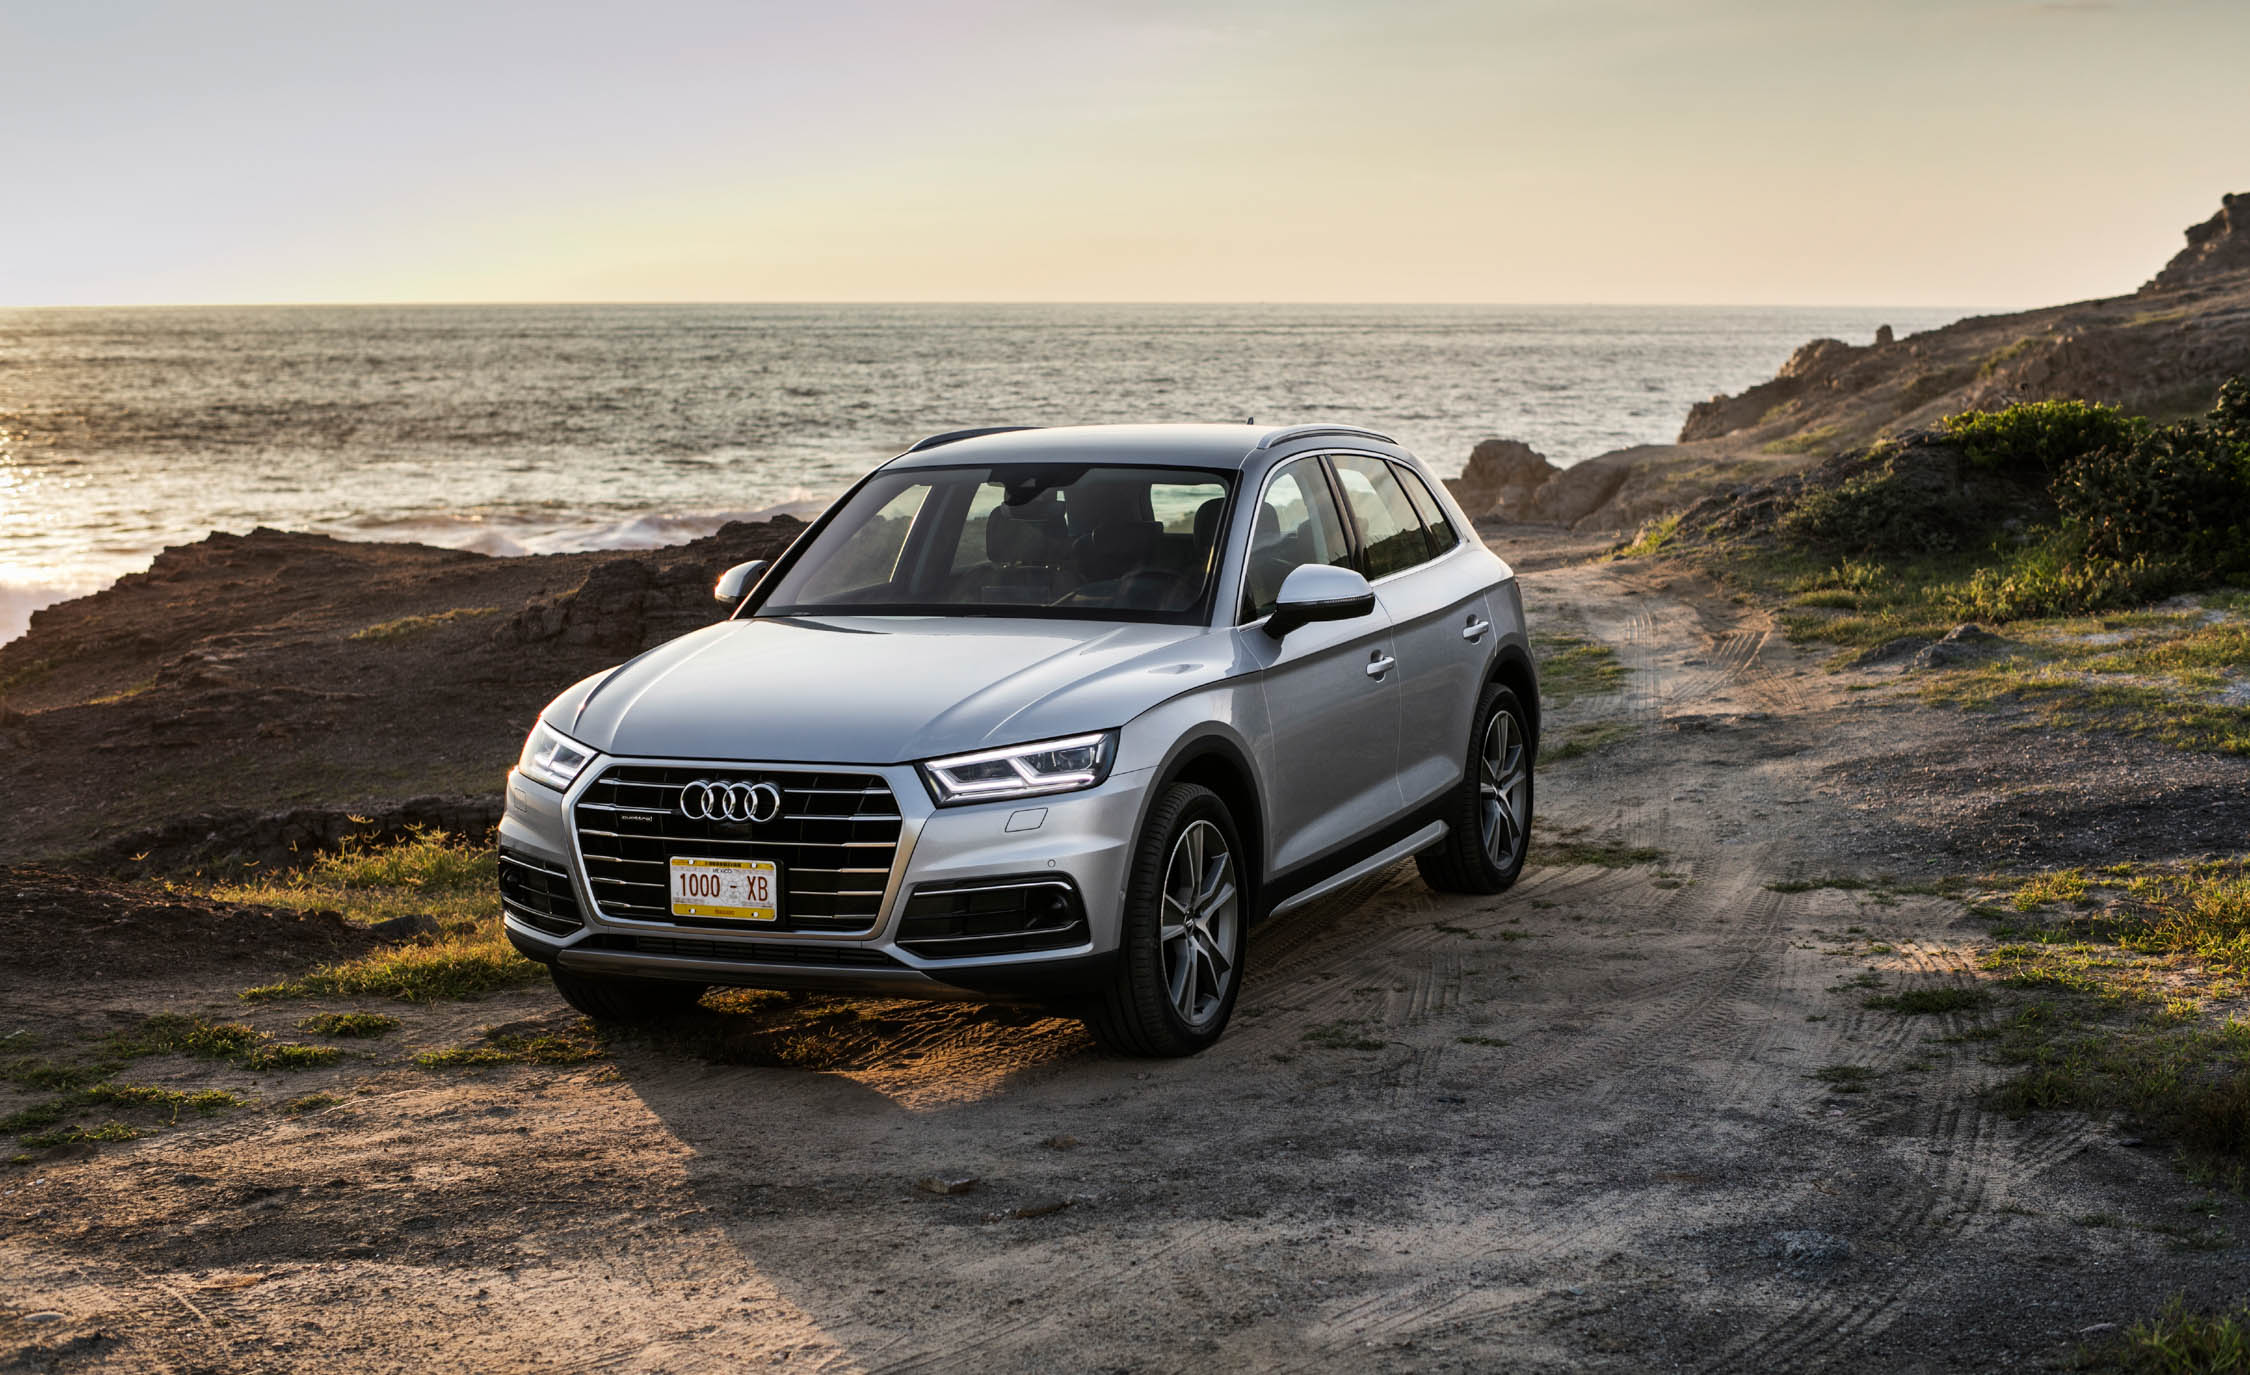 2018 Audi Q (View 36 of 40)